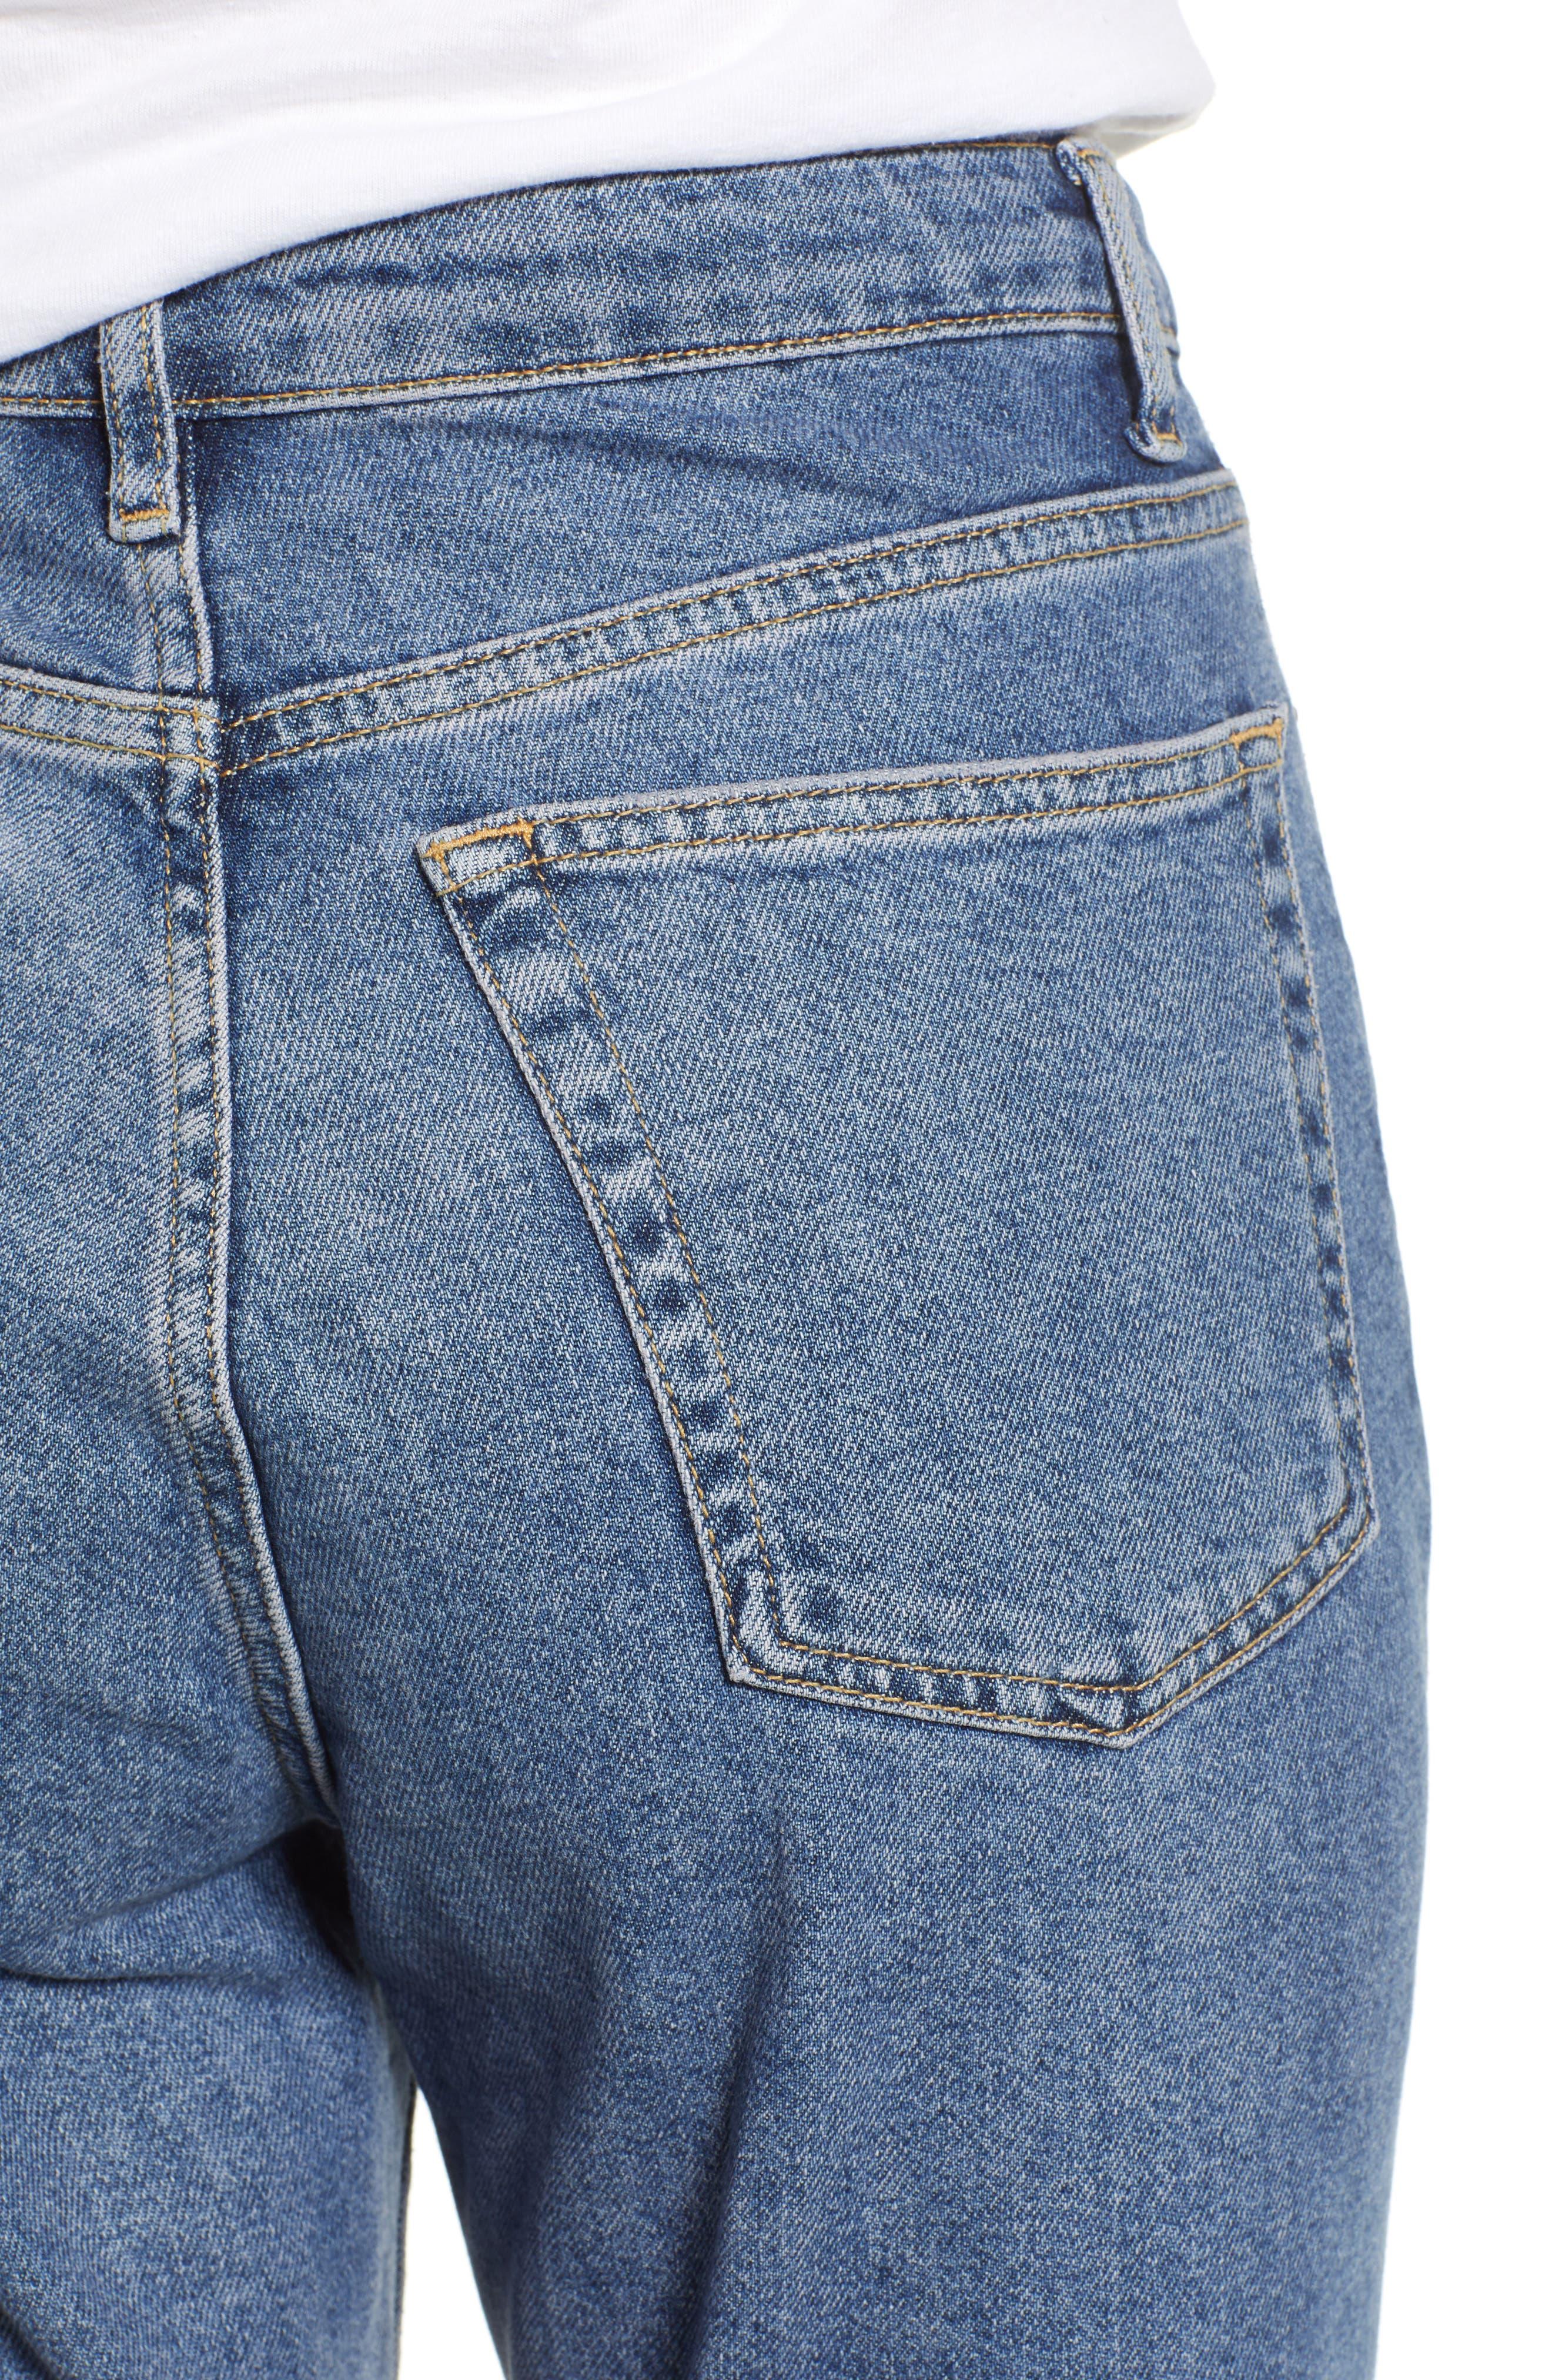 TOPSHOP, Straight Leg Jeans, Alternate thumbnail 5, color, MID DENIM